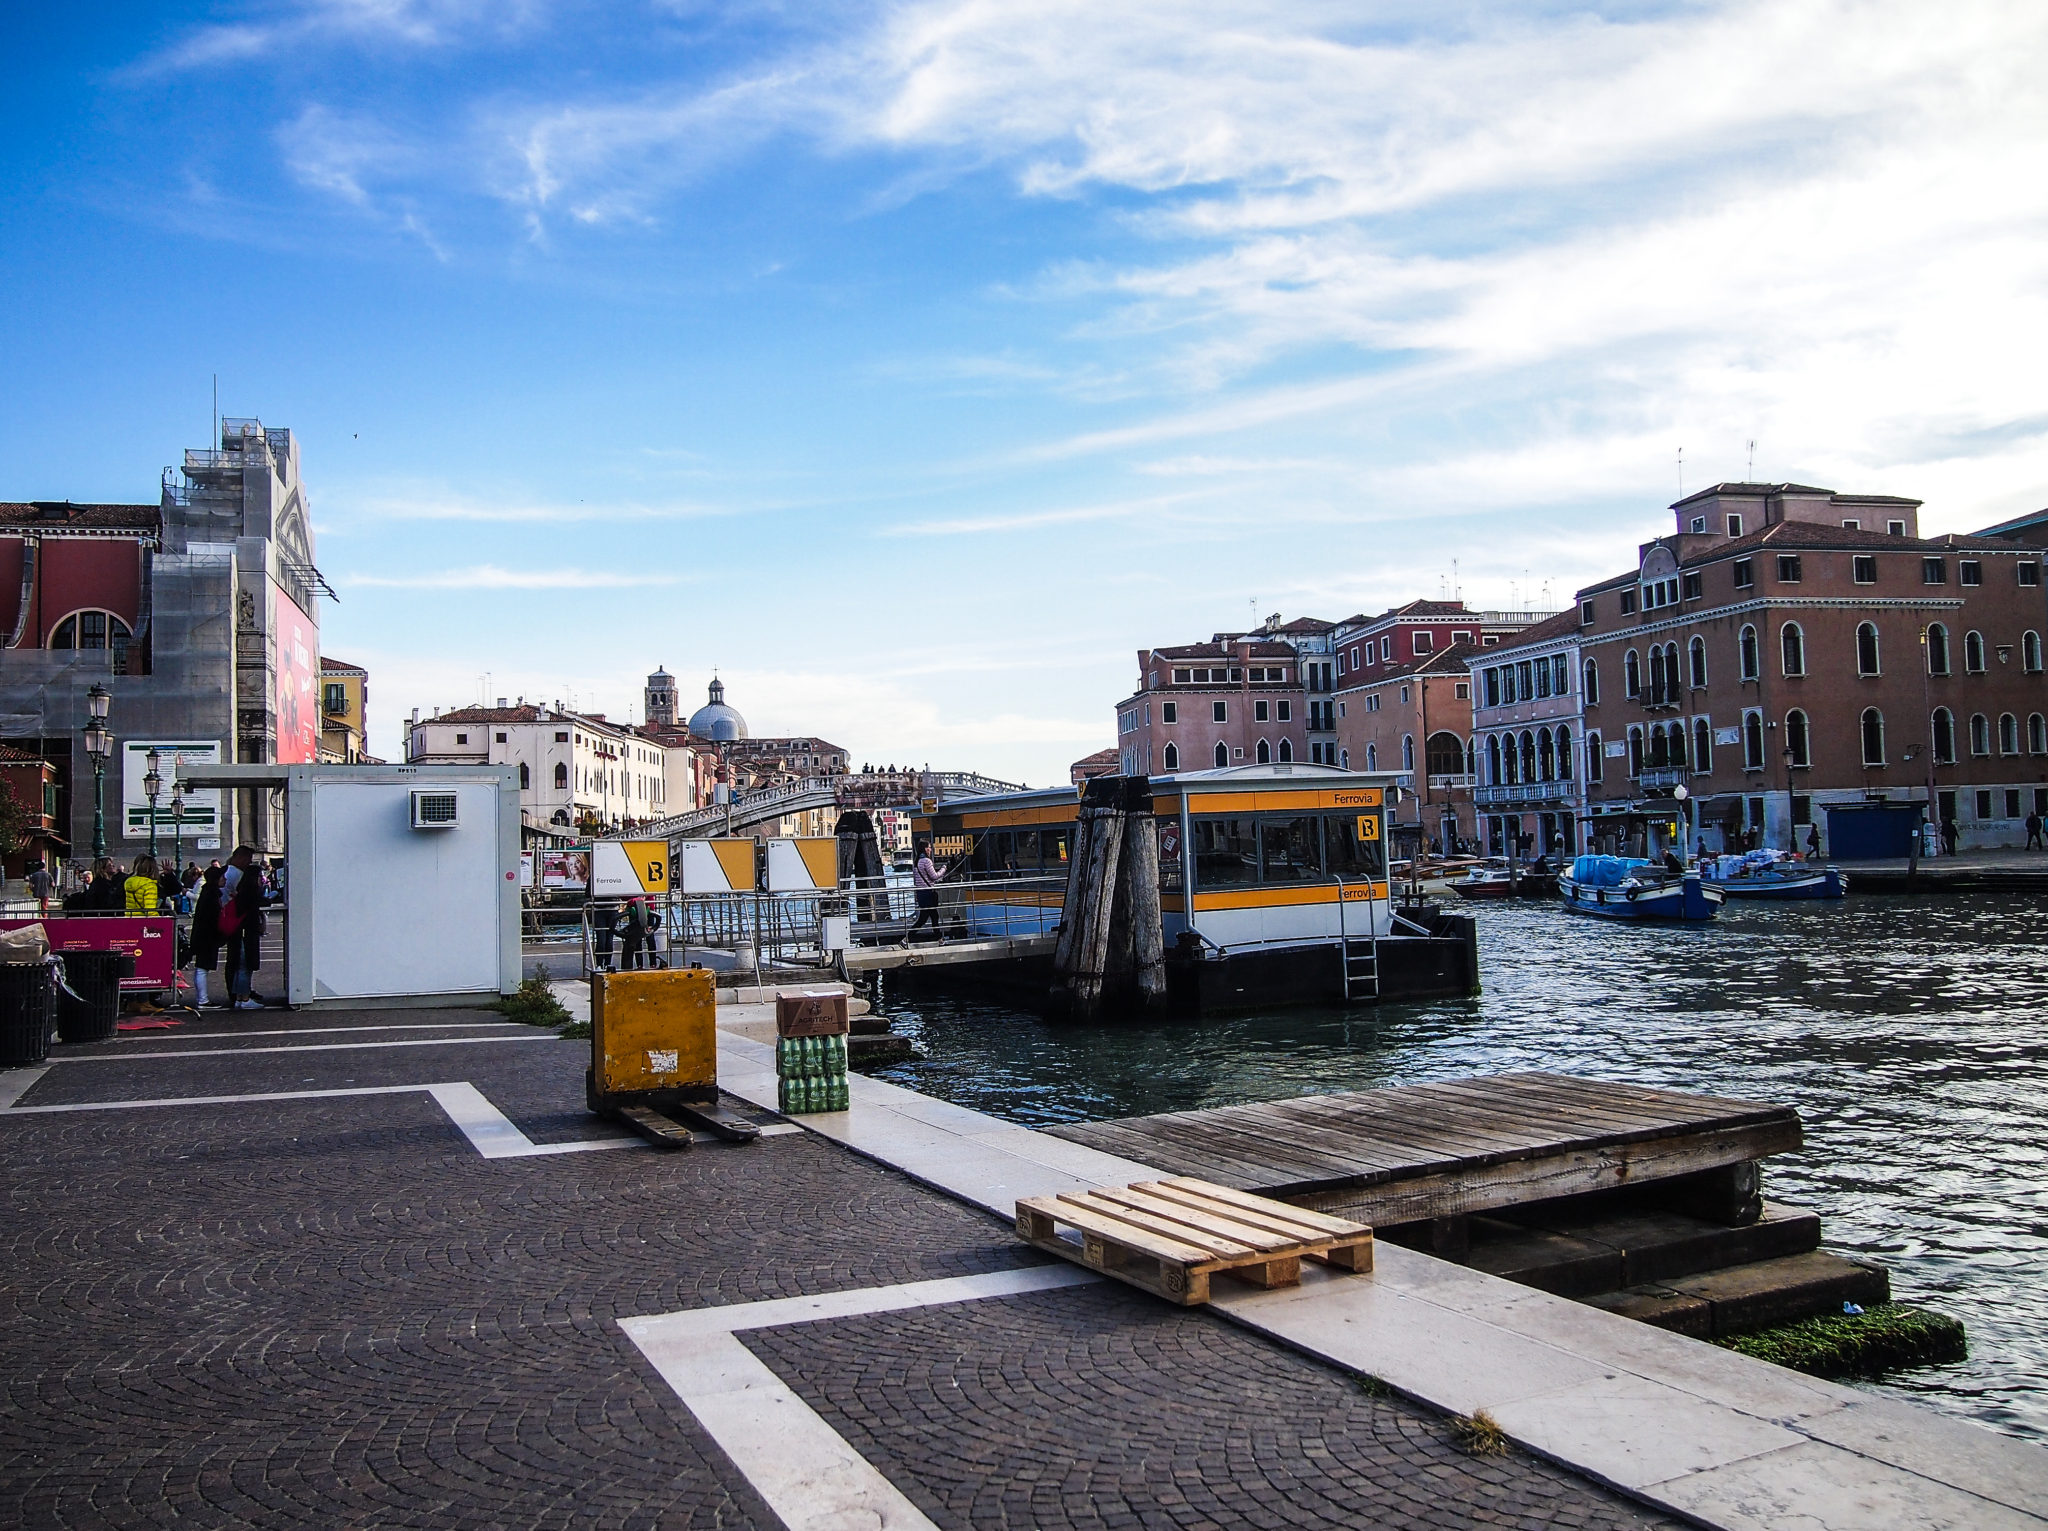 vaporetto venezia benátky